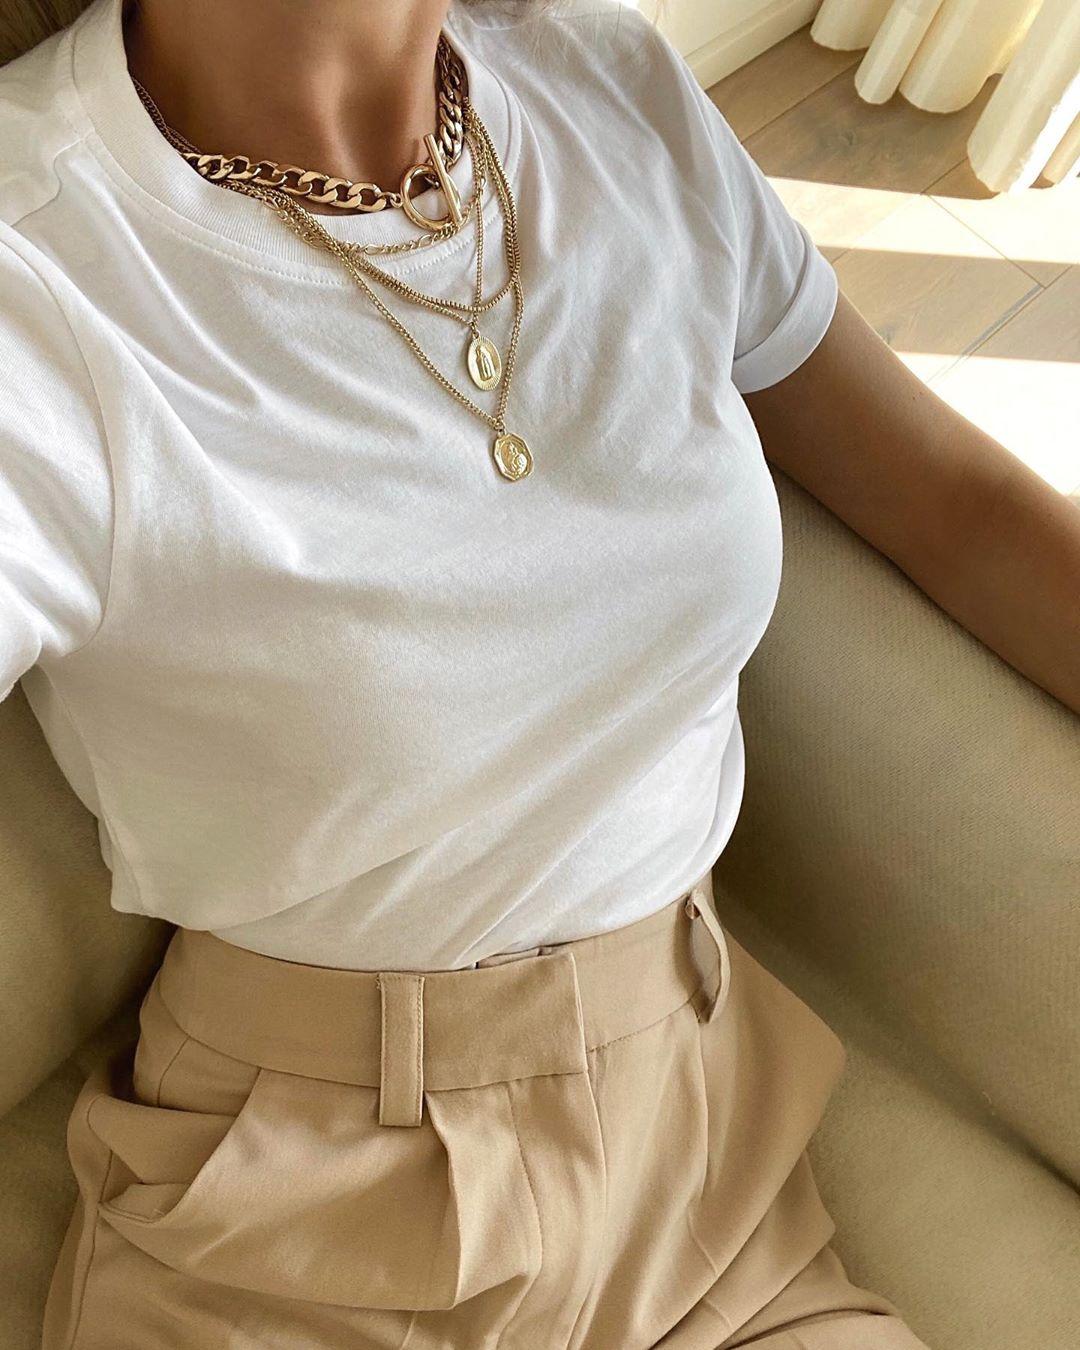 15 White T-Shirts That Are Wardrobe Staples